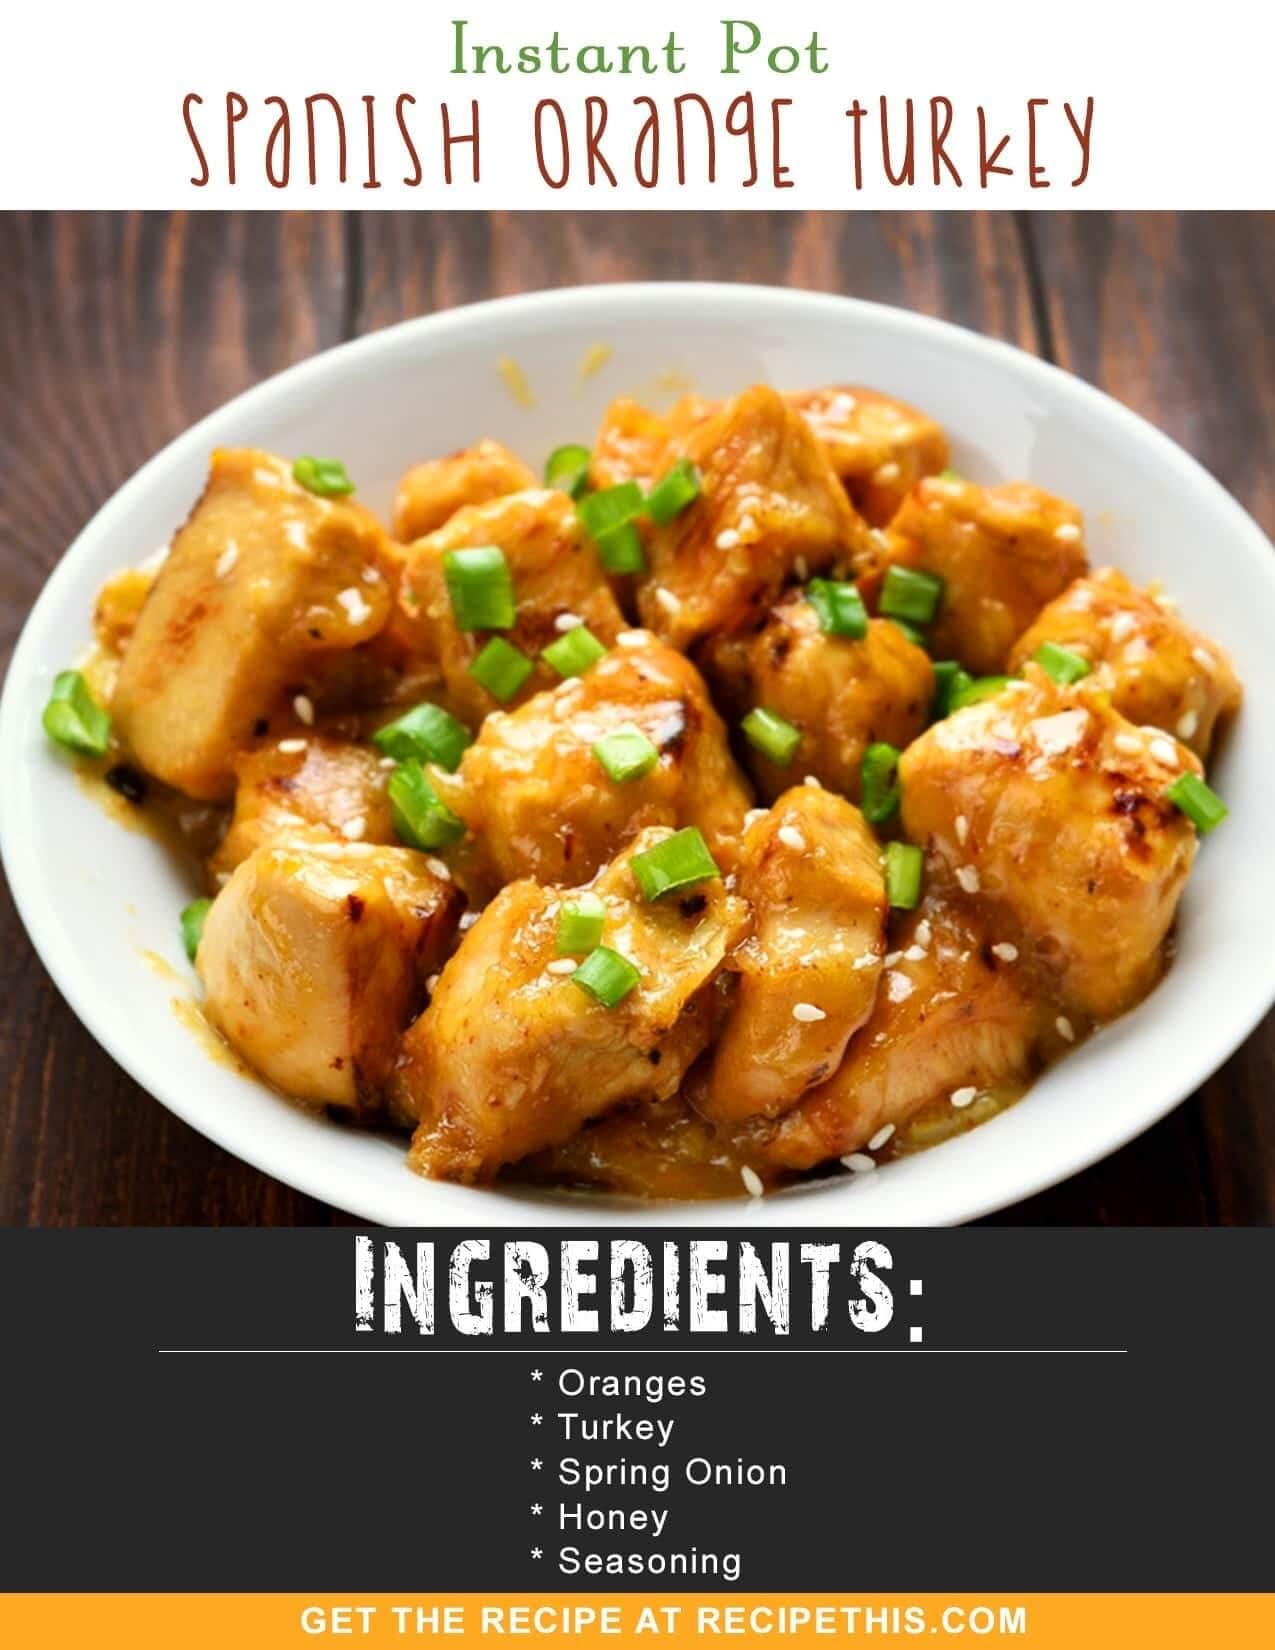 Instant Pot Recipes | Instant Pot Spanish Orange Turkey recipe from RecipeThis.com